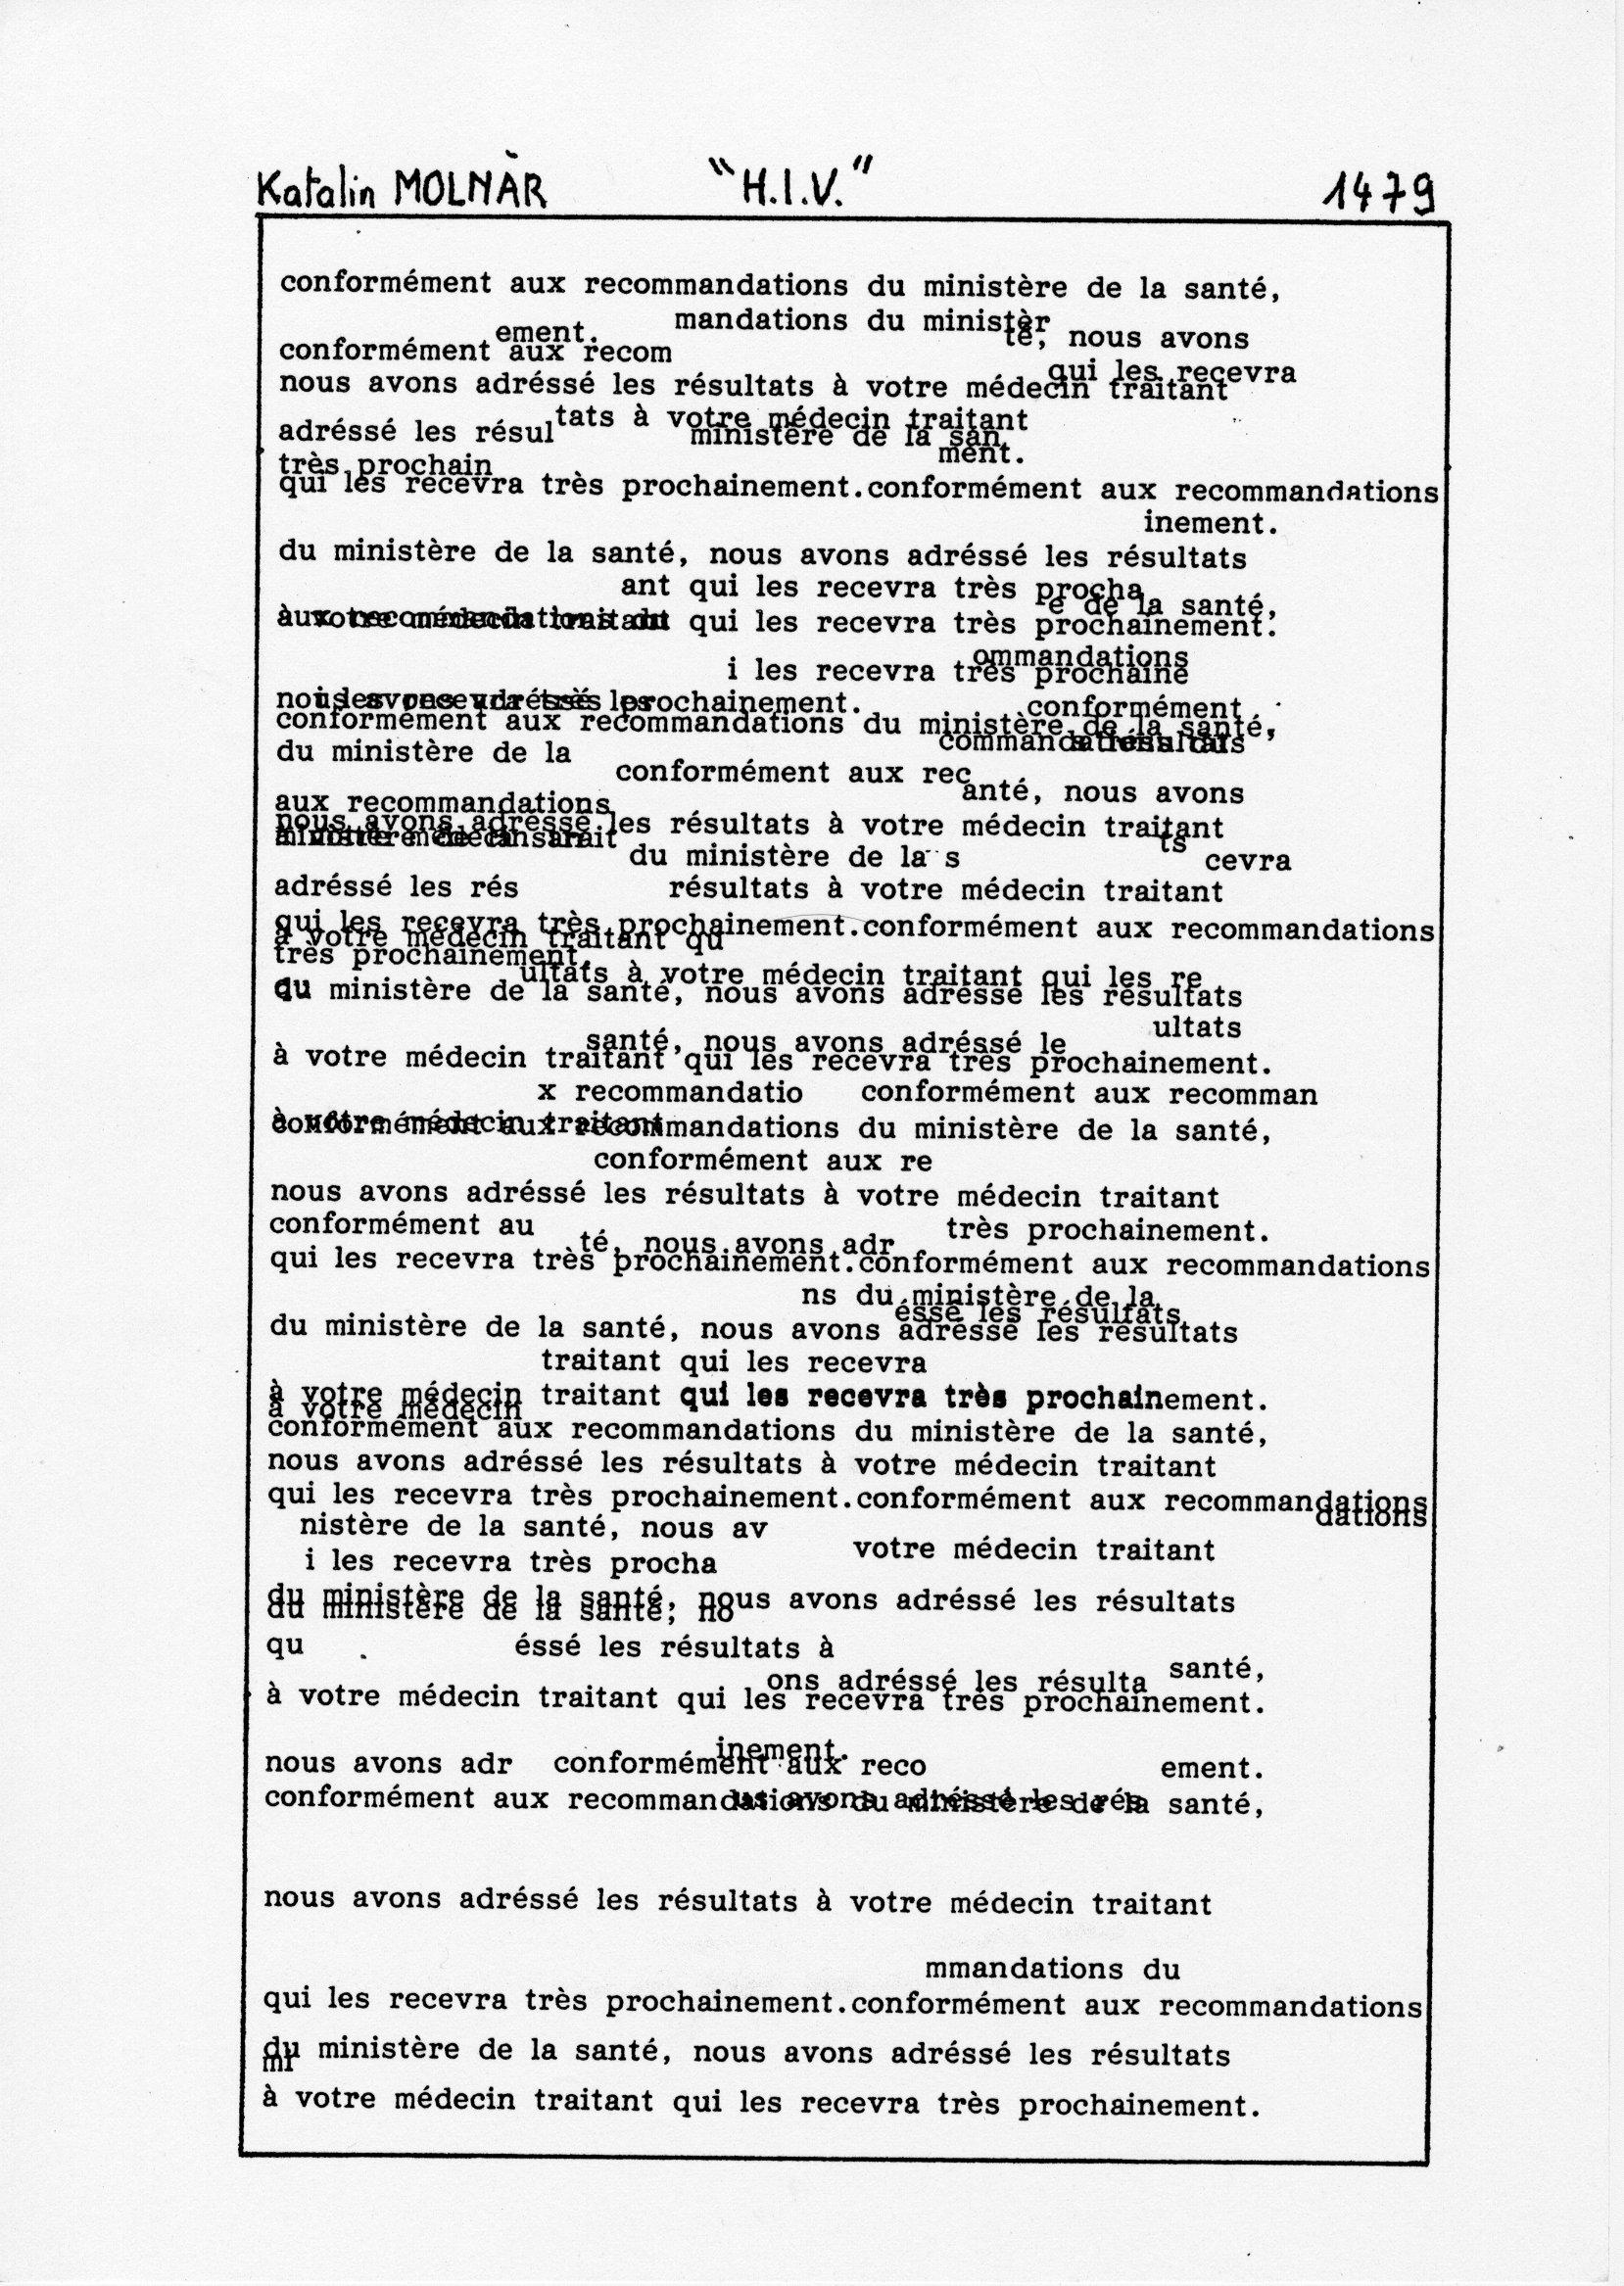 page 1479 K. Molnar H.I.V.